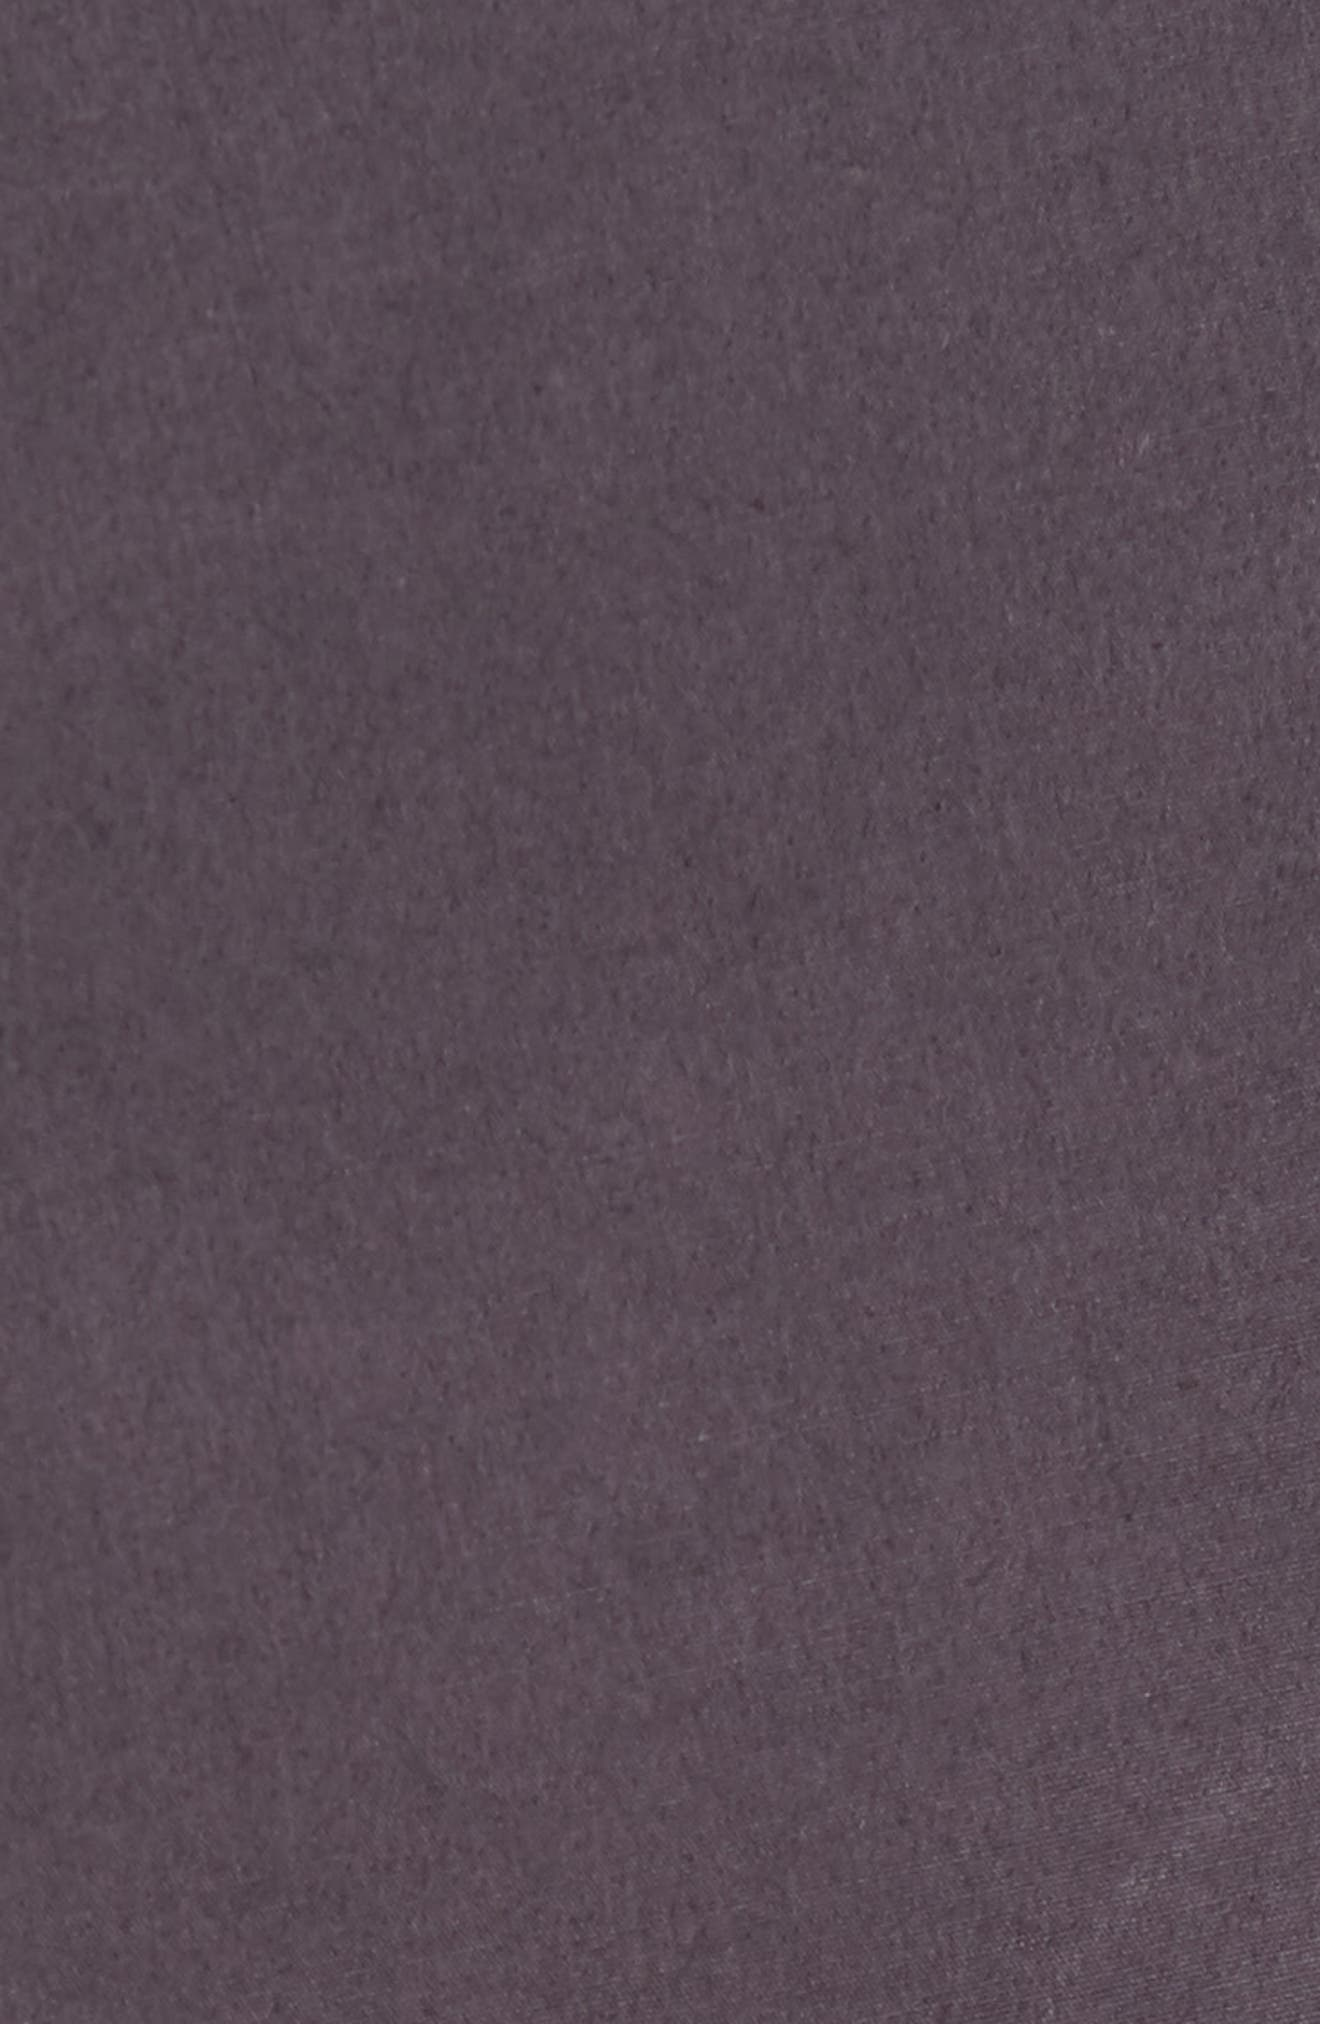 Slim Stretch Poplin Drawcord Pants,                             Alternate thumbnail 18, color,